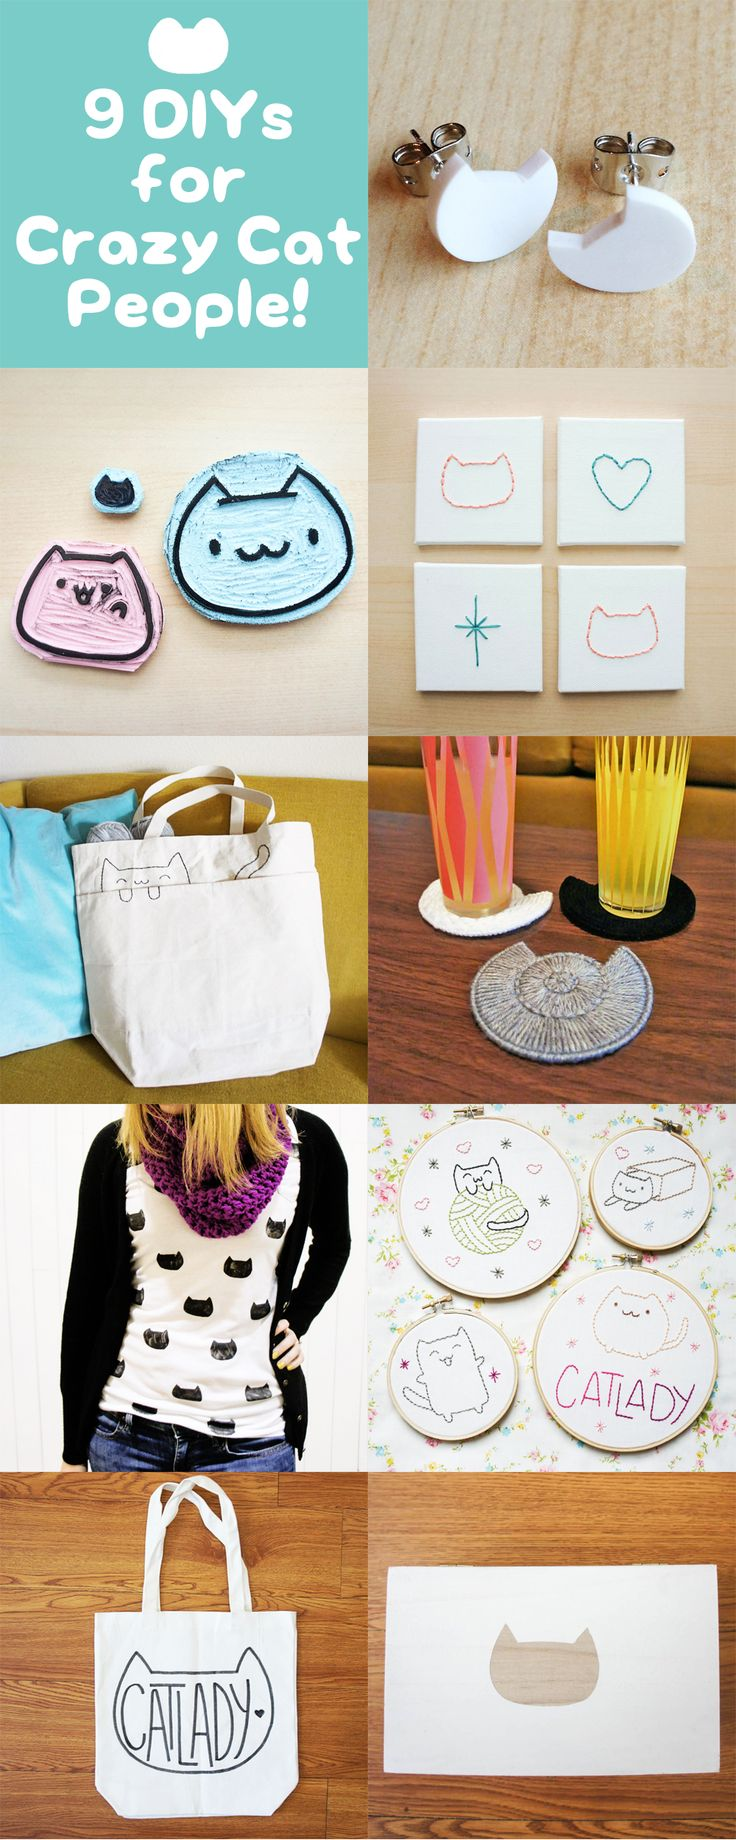 9 DIYs for Crazy Cat People